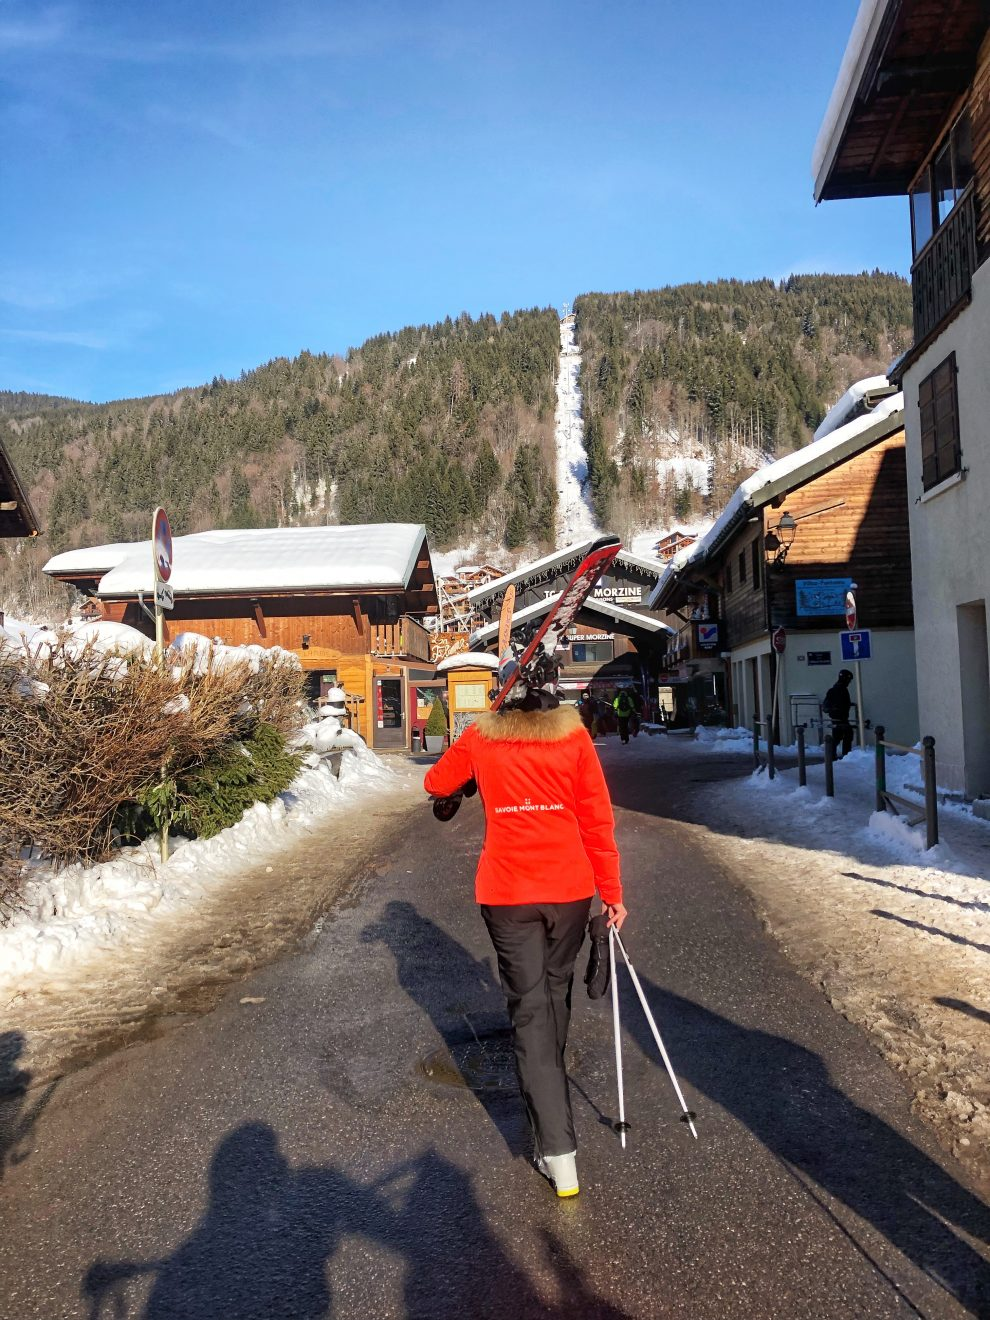 Wintersport Frankrijk Portes du Soleil ; Verbindingslift van Les Gets naar Avoriaz.